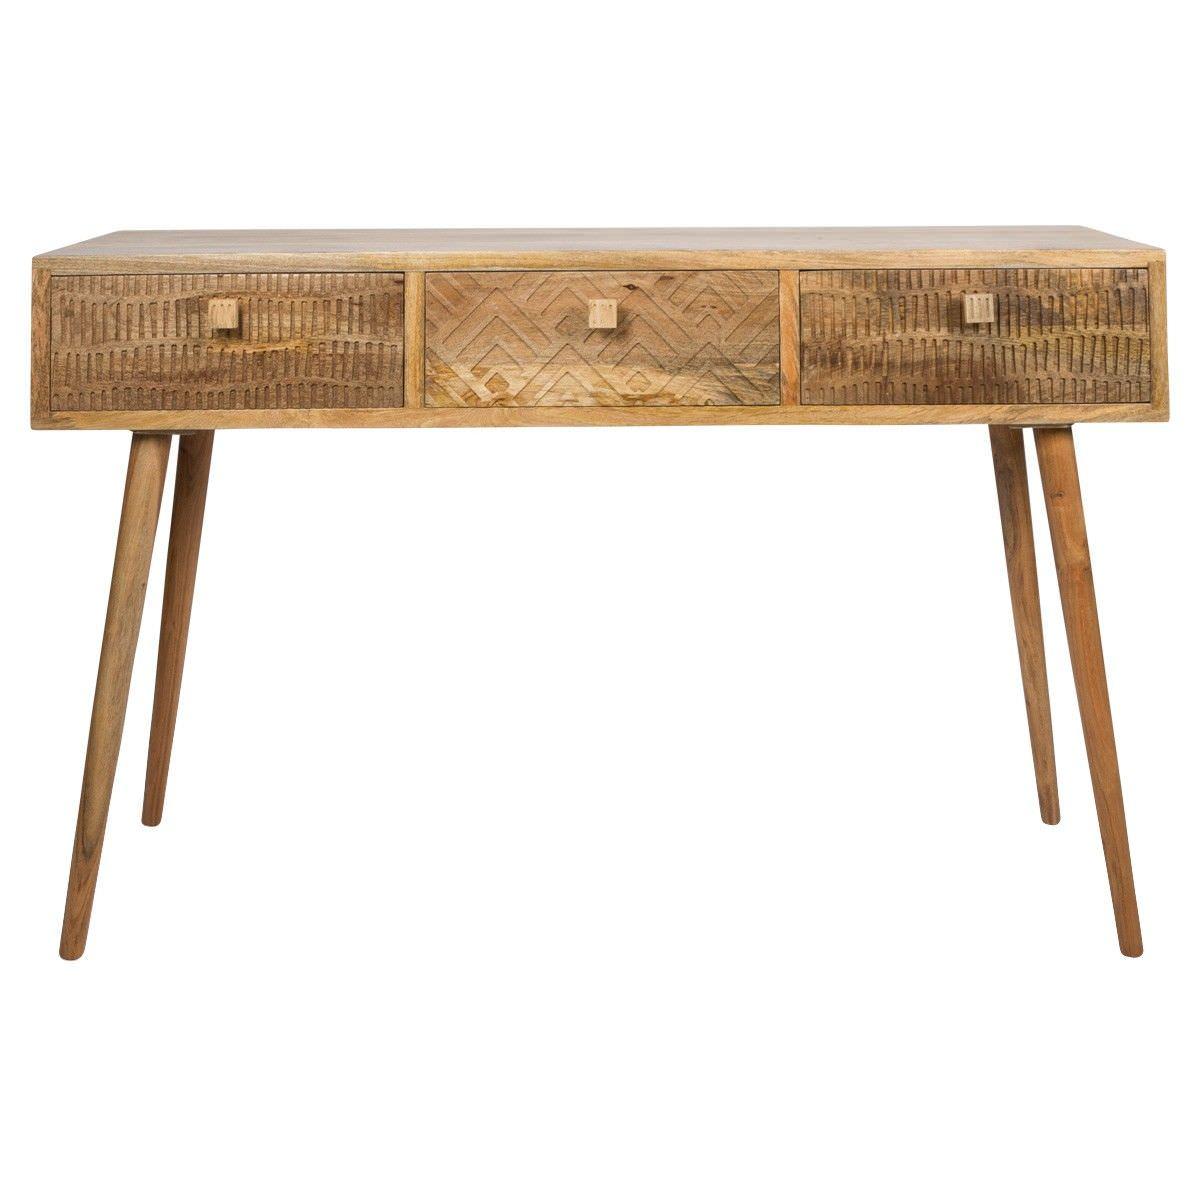 Fb 5680 5 Wood Console Table ~ Ashanti mango wood drawer console table